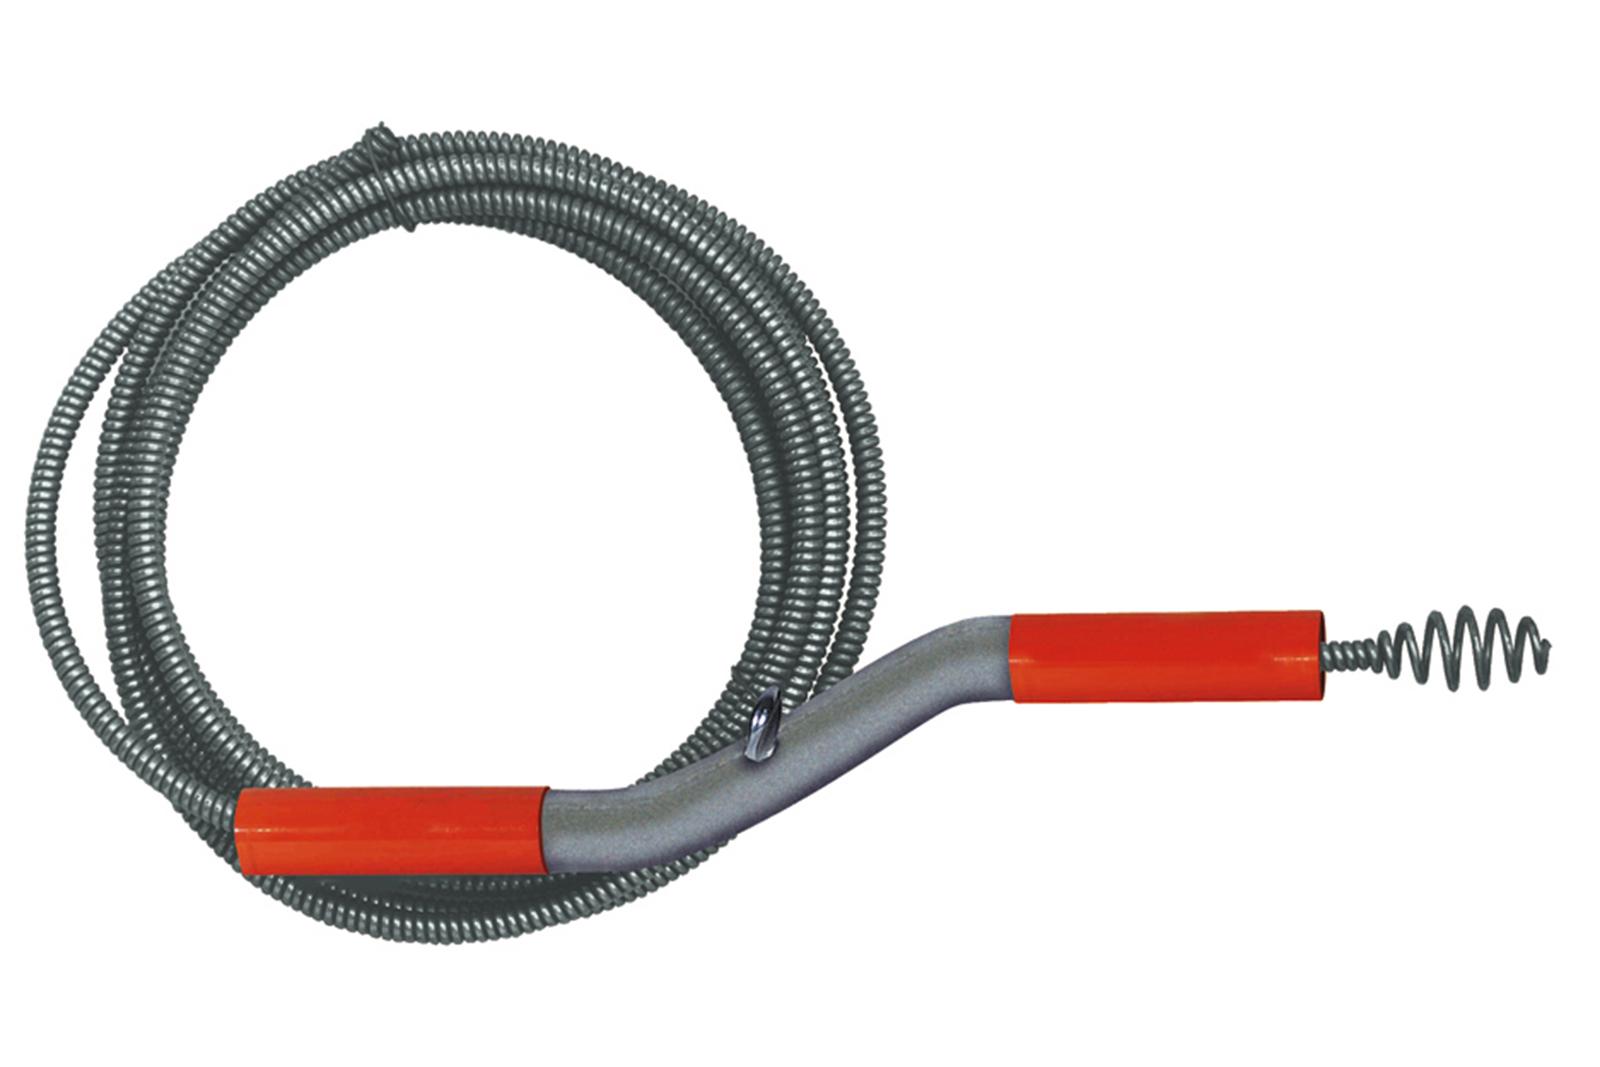 Трос для прочистки General pipe 50fl1-ddh